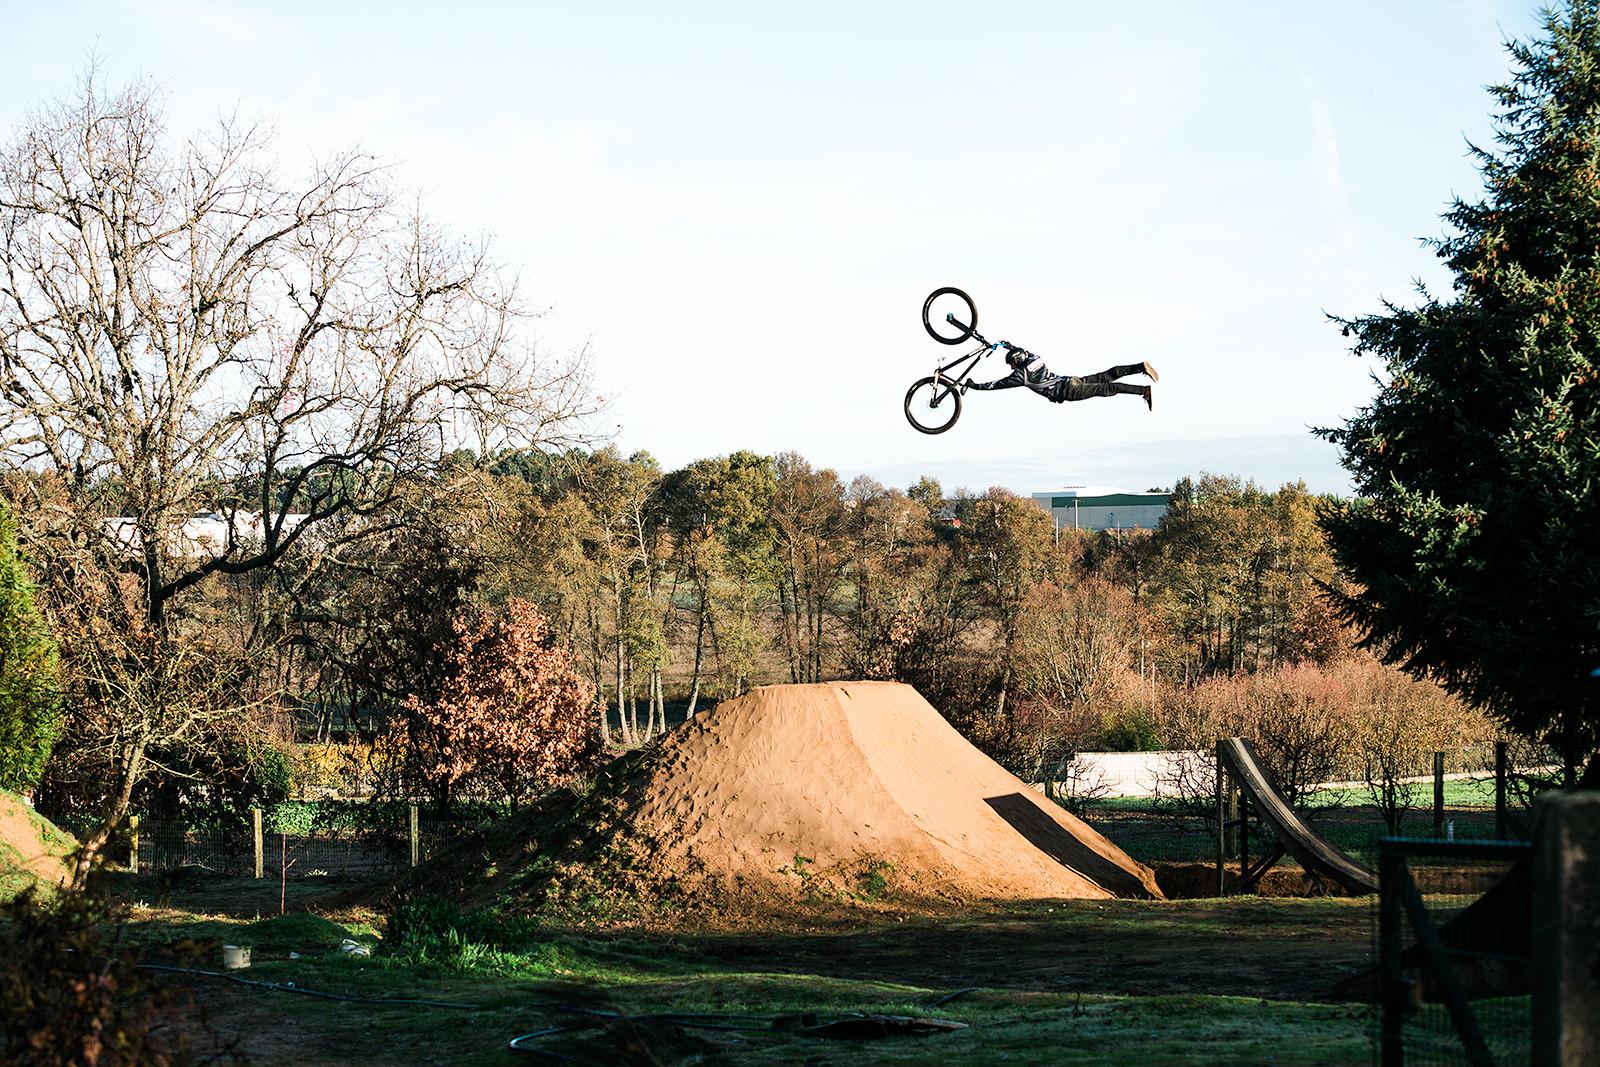 Ricardo Esteves - miguelbento - Mountain Biking Pictures - Vital MTB